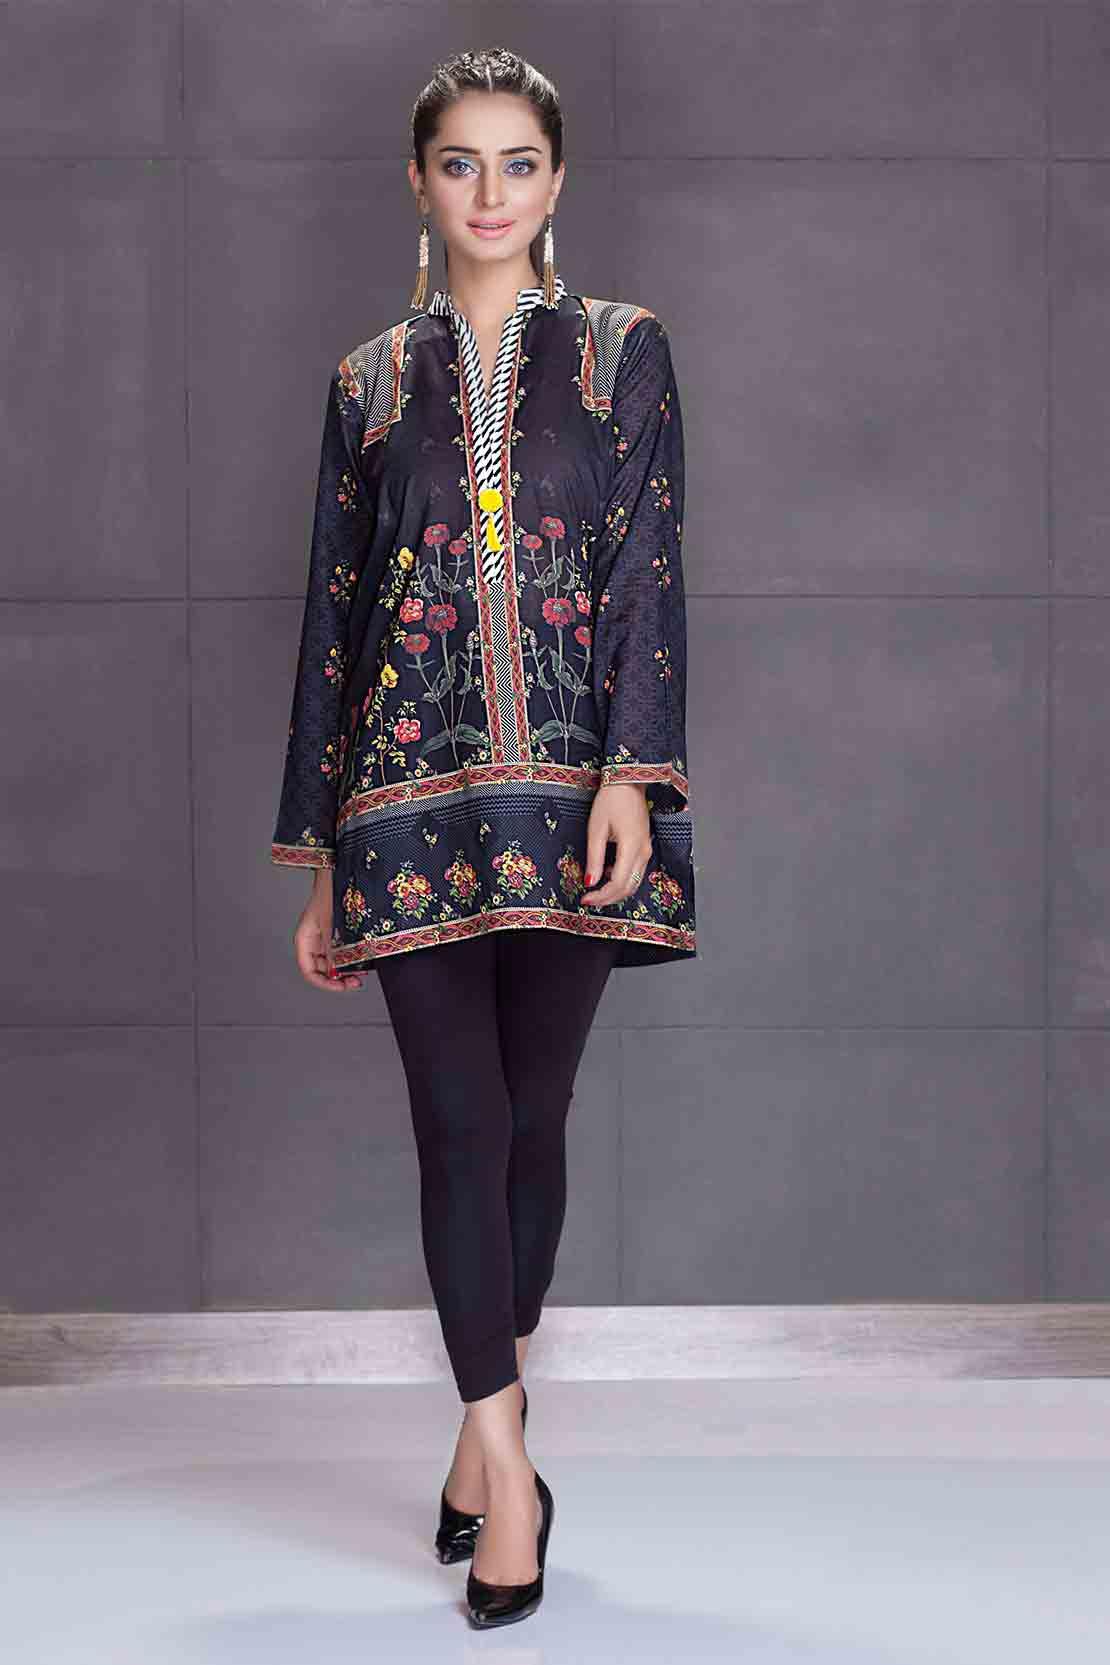 So kamal black kurti new eid dress designs for girls in Pakistan 2017